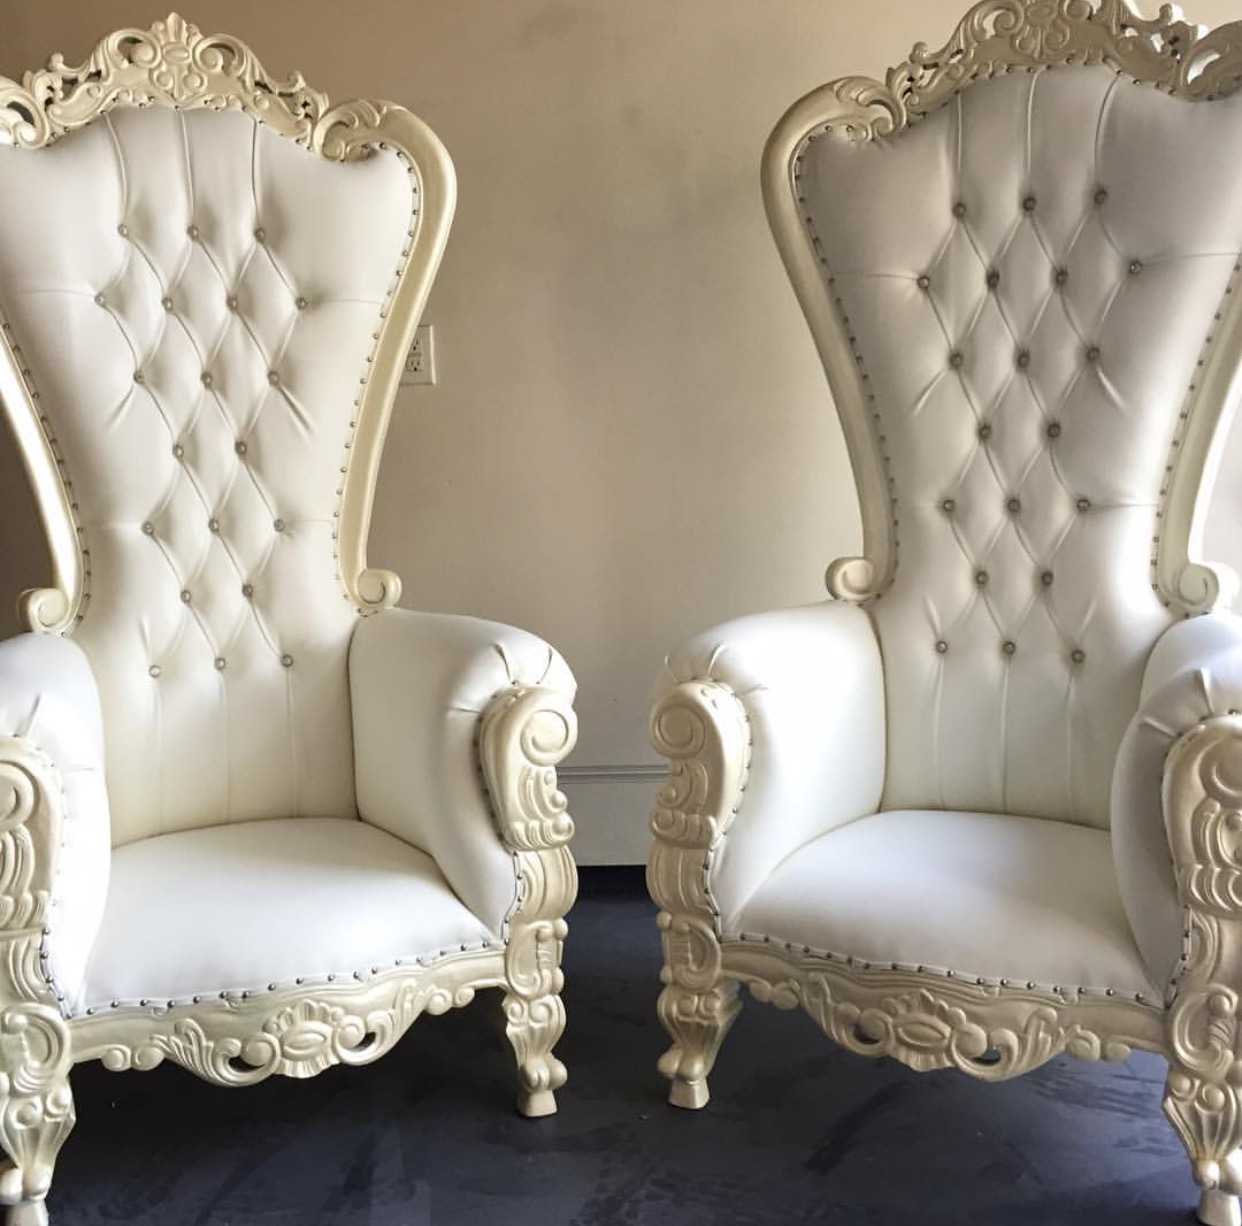 Nj Ny Throne Chair Rentals New Jersey New York S Wedding Dj Nj